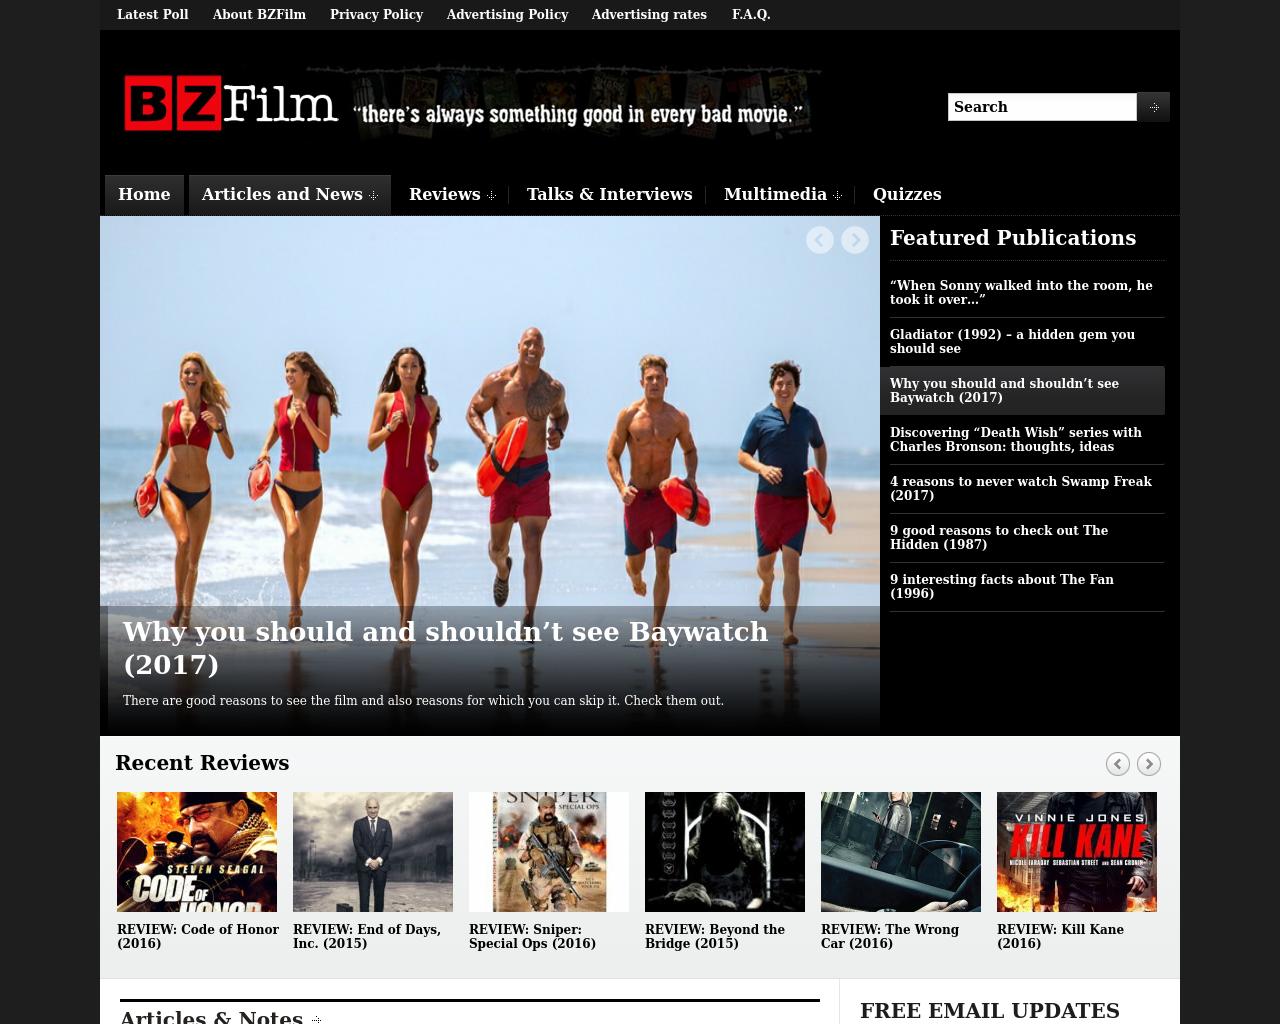 BZFilm-Advertising-Reviews-Pricing